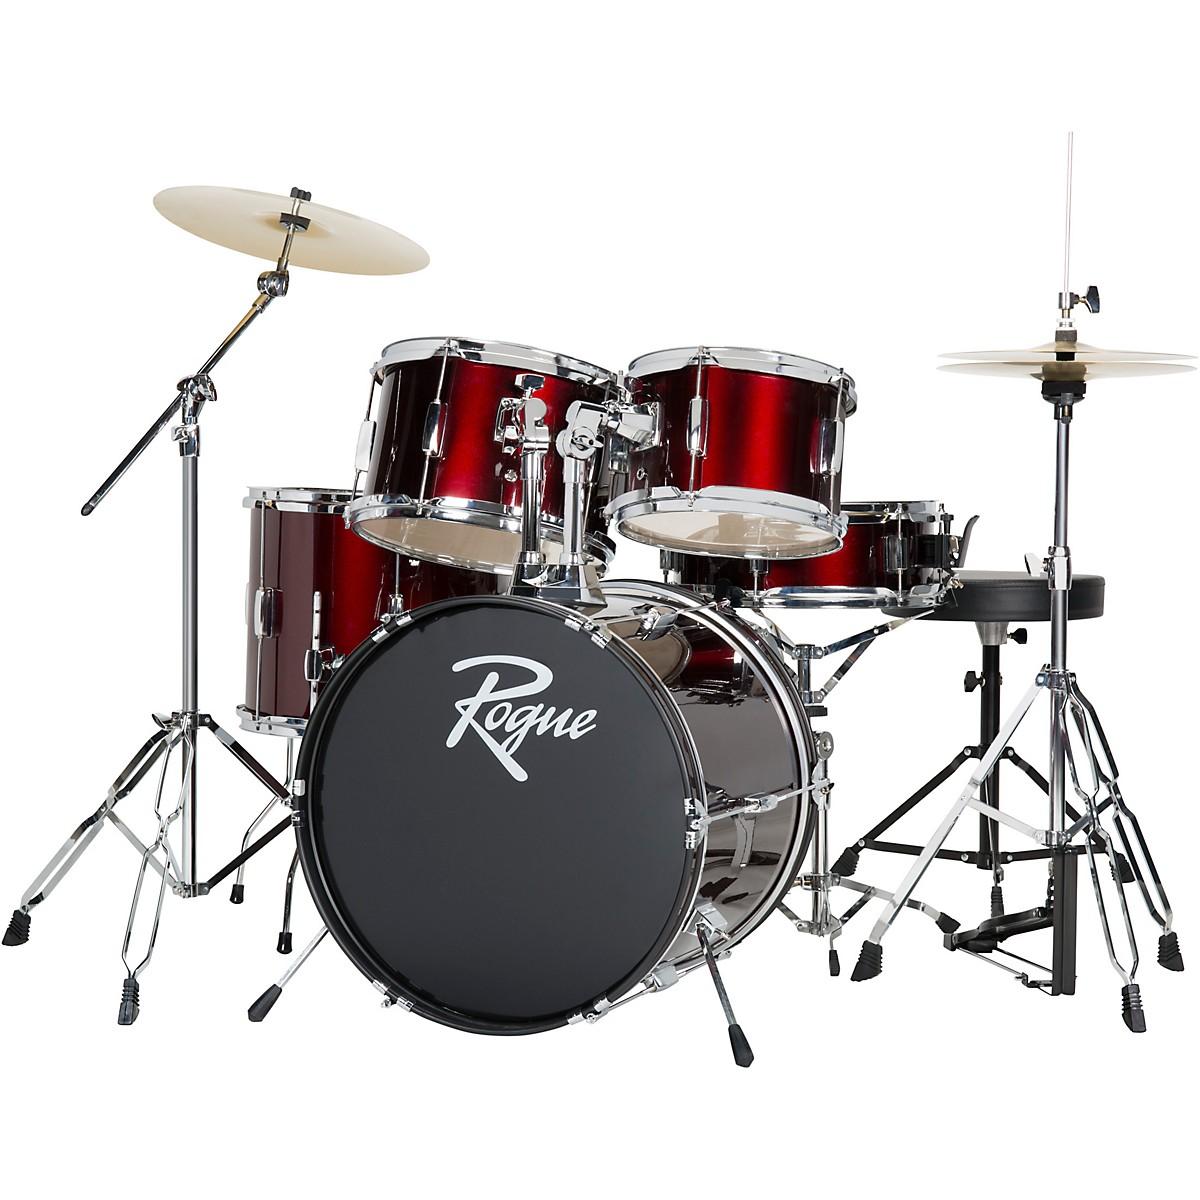 Rogue 5-Piece Complete Drum Set